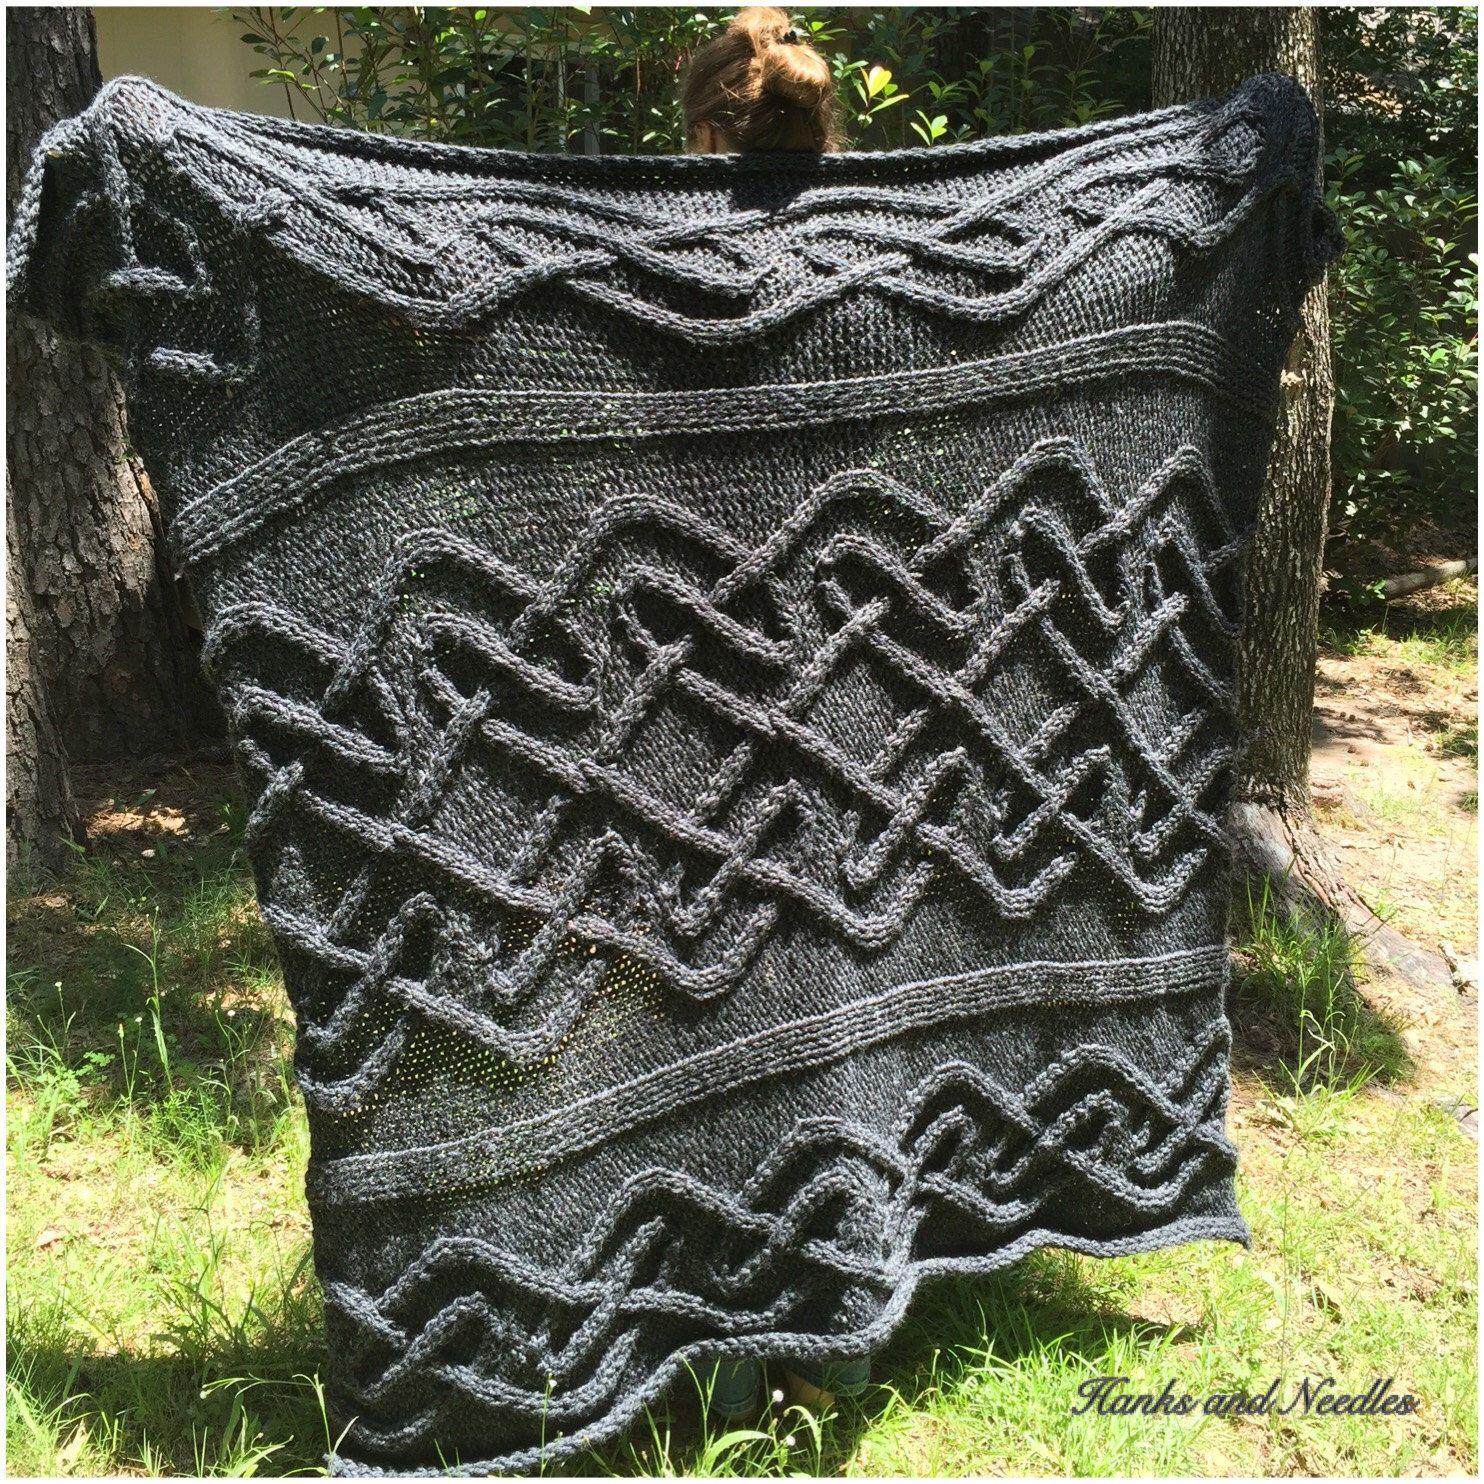 Aran knit chunky wool blanket custom order acrylic throw cable aran knit chunky wool blanket custom order acrylic throw cable knit afghan thick bankloansurffo Image collections